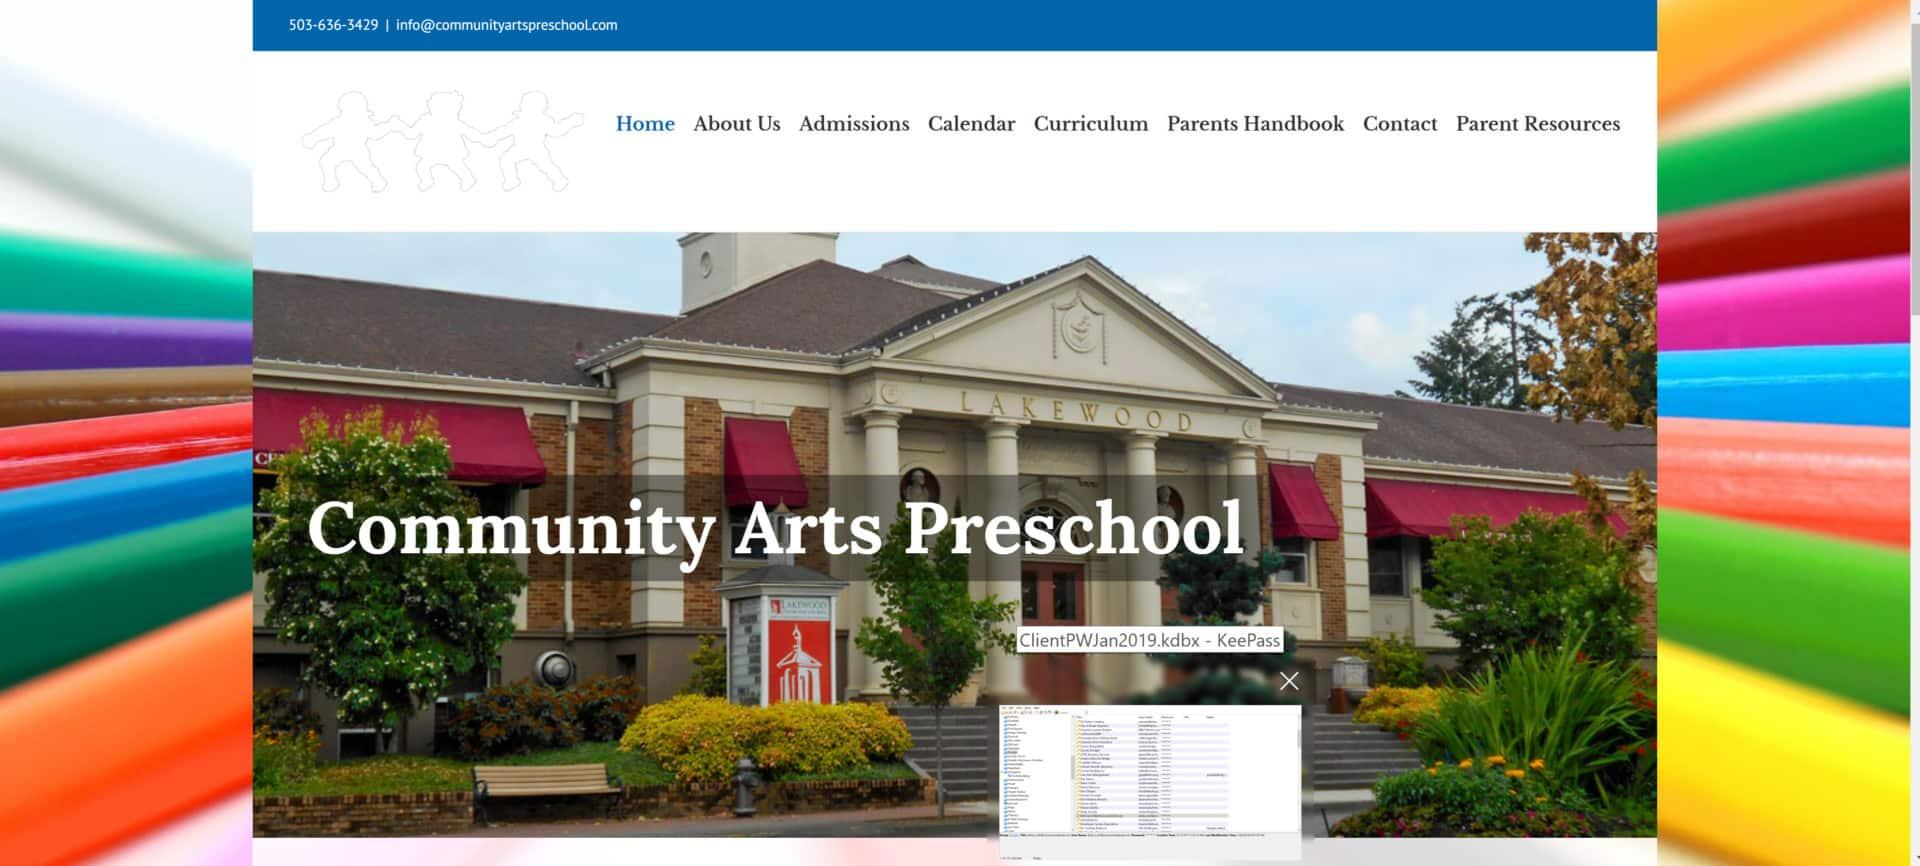 Community Arts Preschool